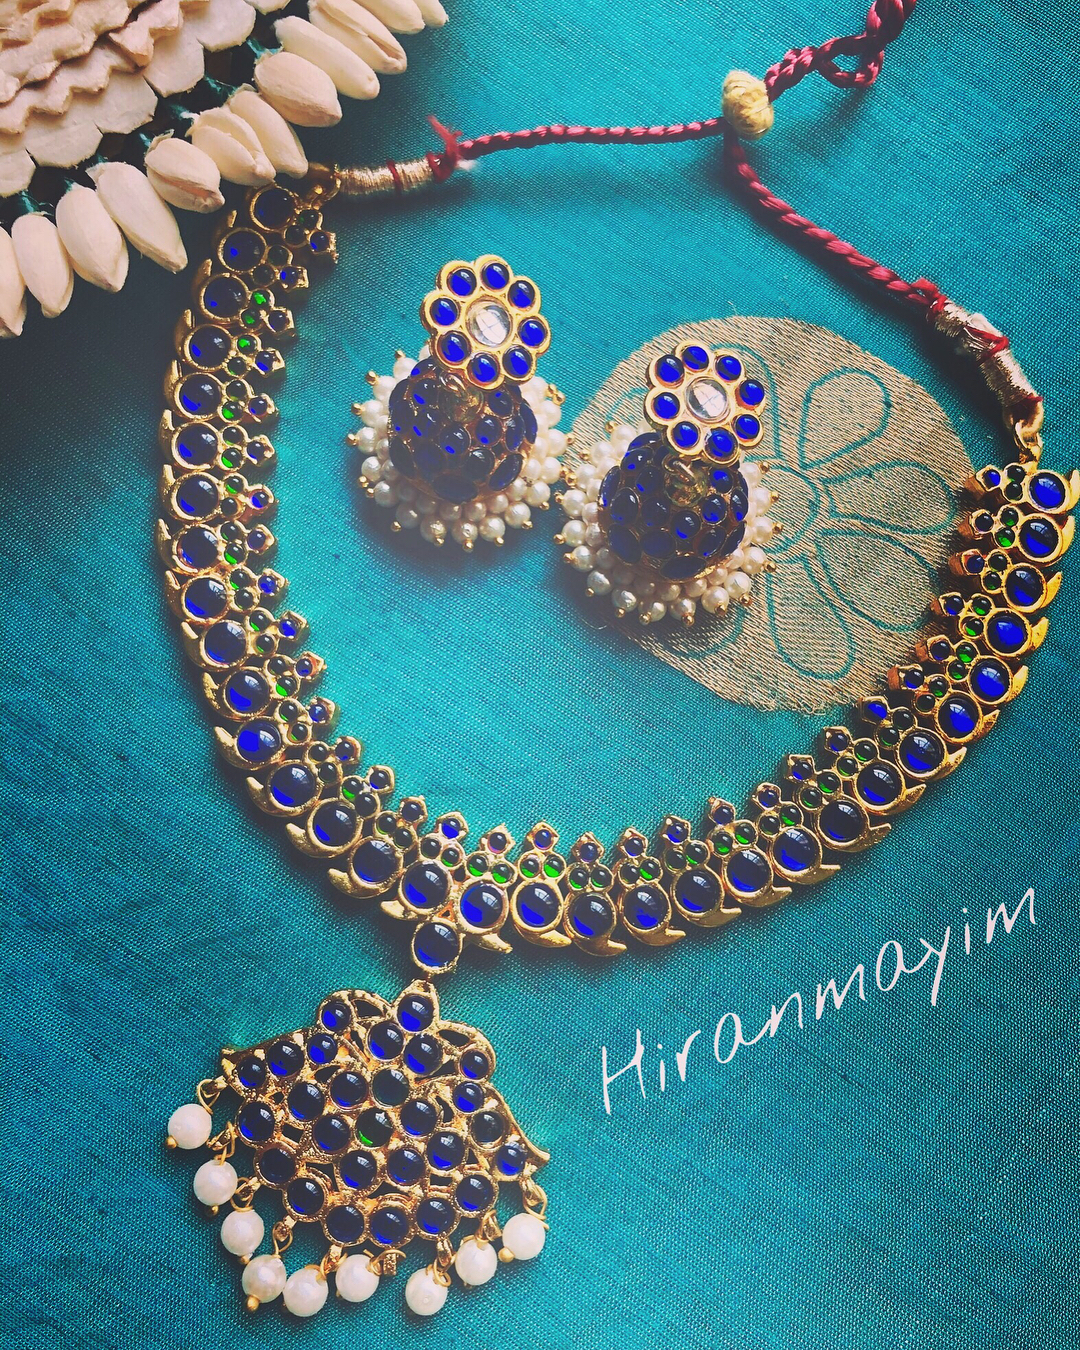 kemp-jewellery-designs-shop-online (1)